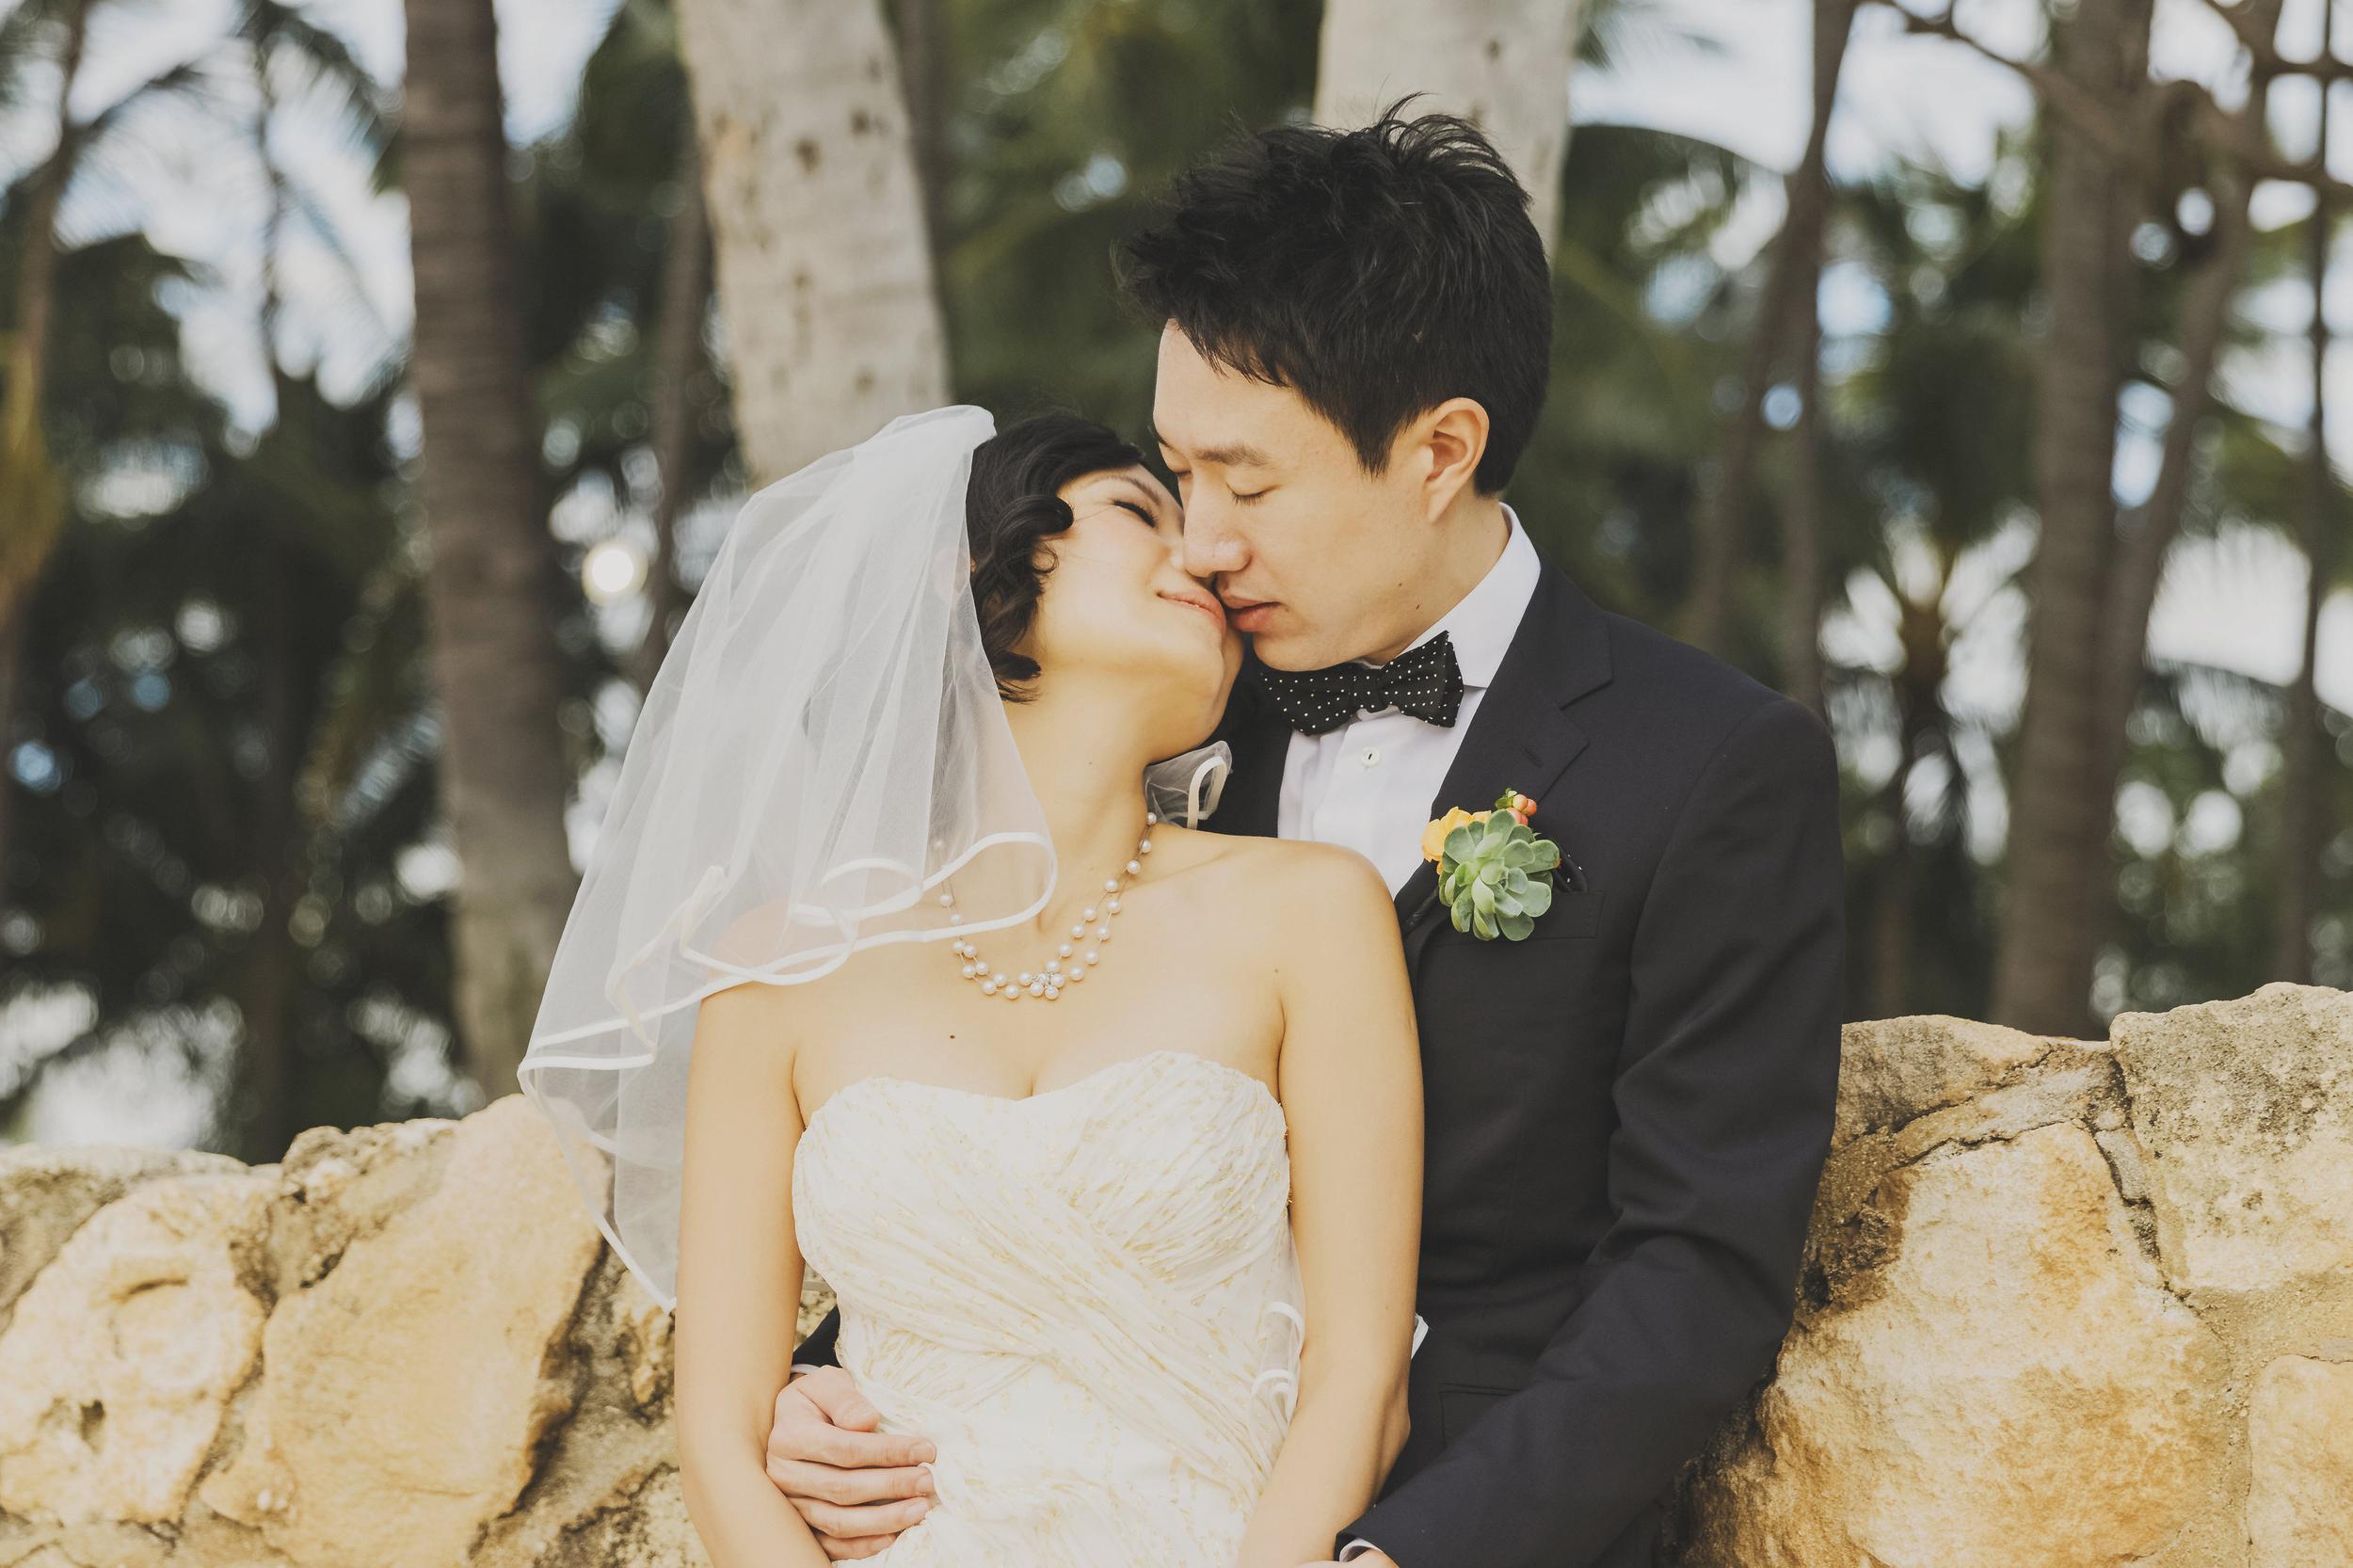 angie-diaz-photography-oahu-wedding-lanikuhonoa-shenshen-marshall-42.jpg